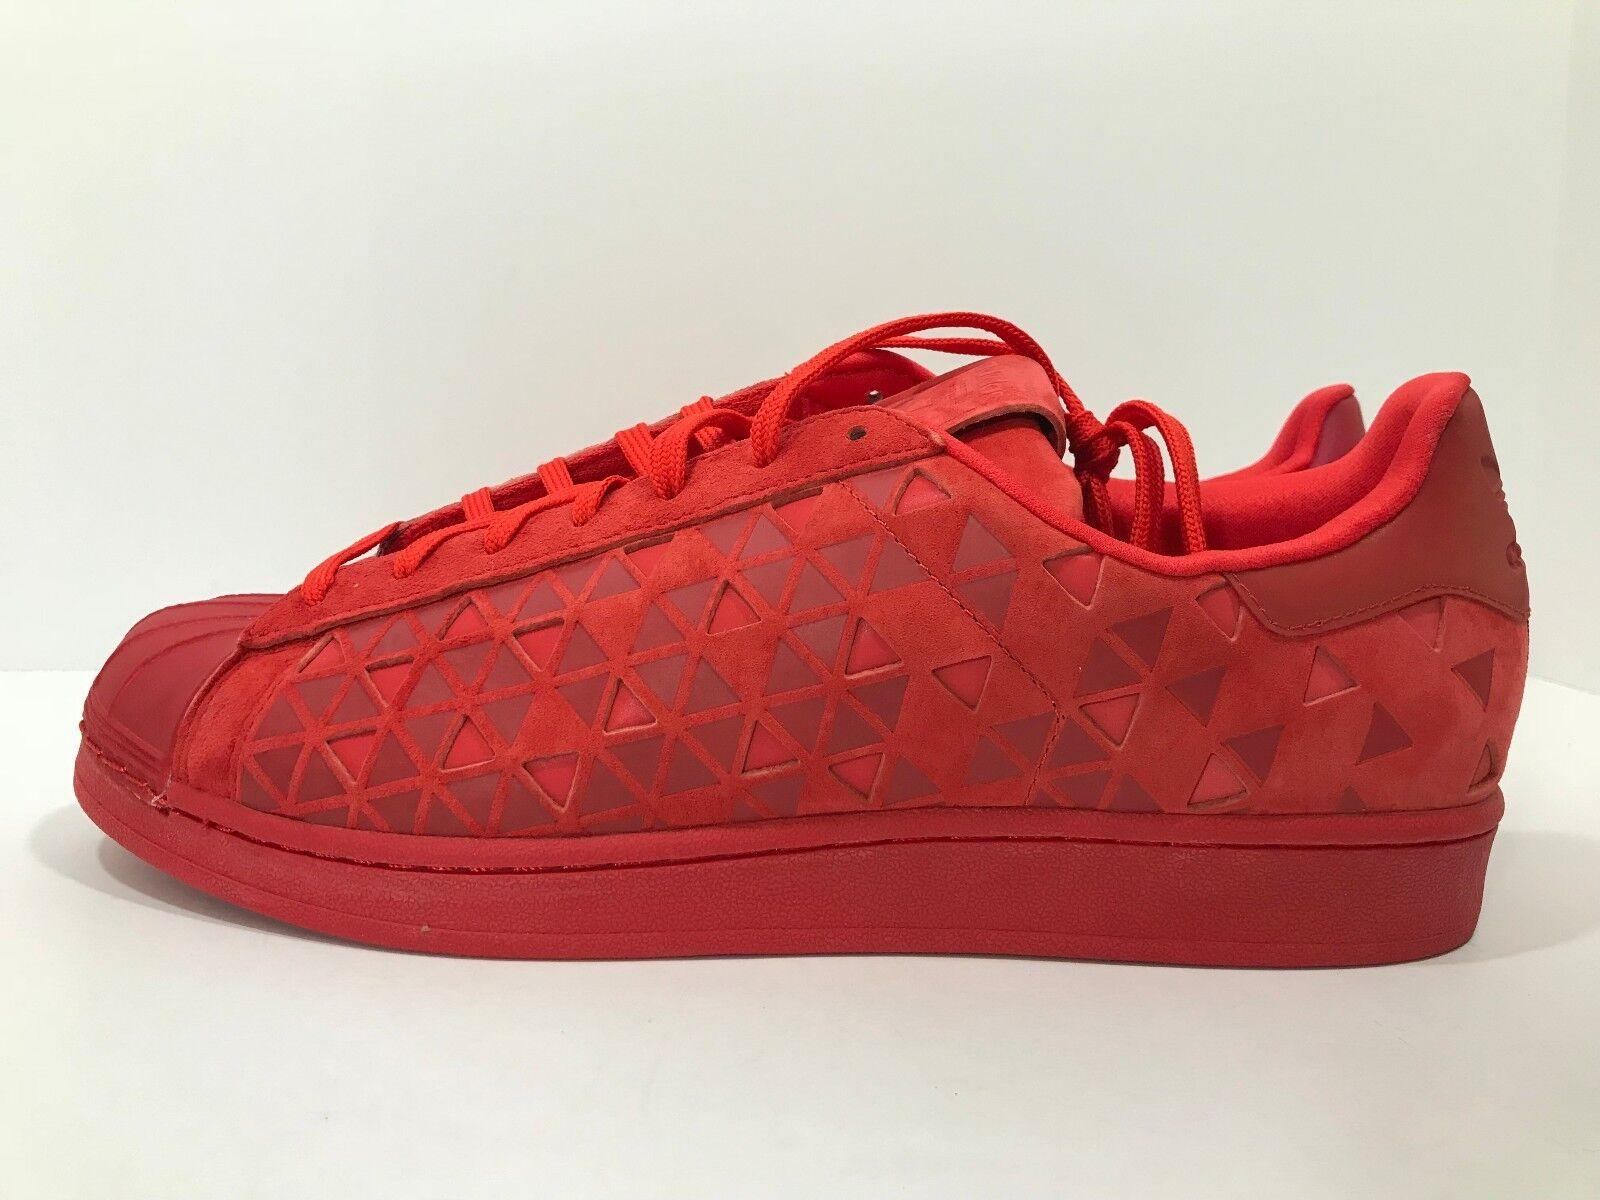 New Adidas Superstar XENO Men's Size 11.5 Vivid Mono Red Reflective AQ8181